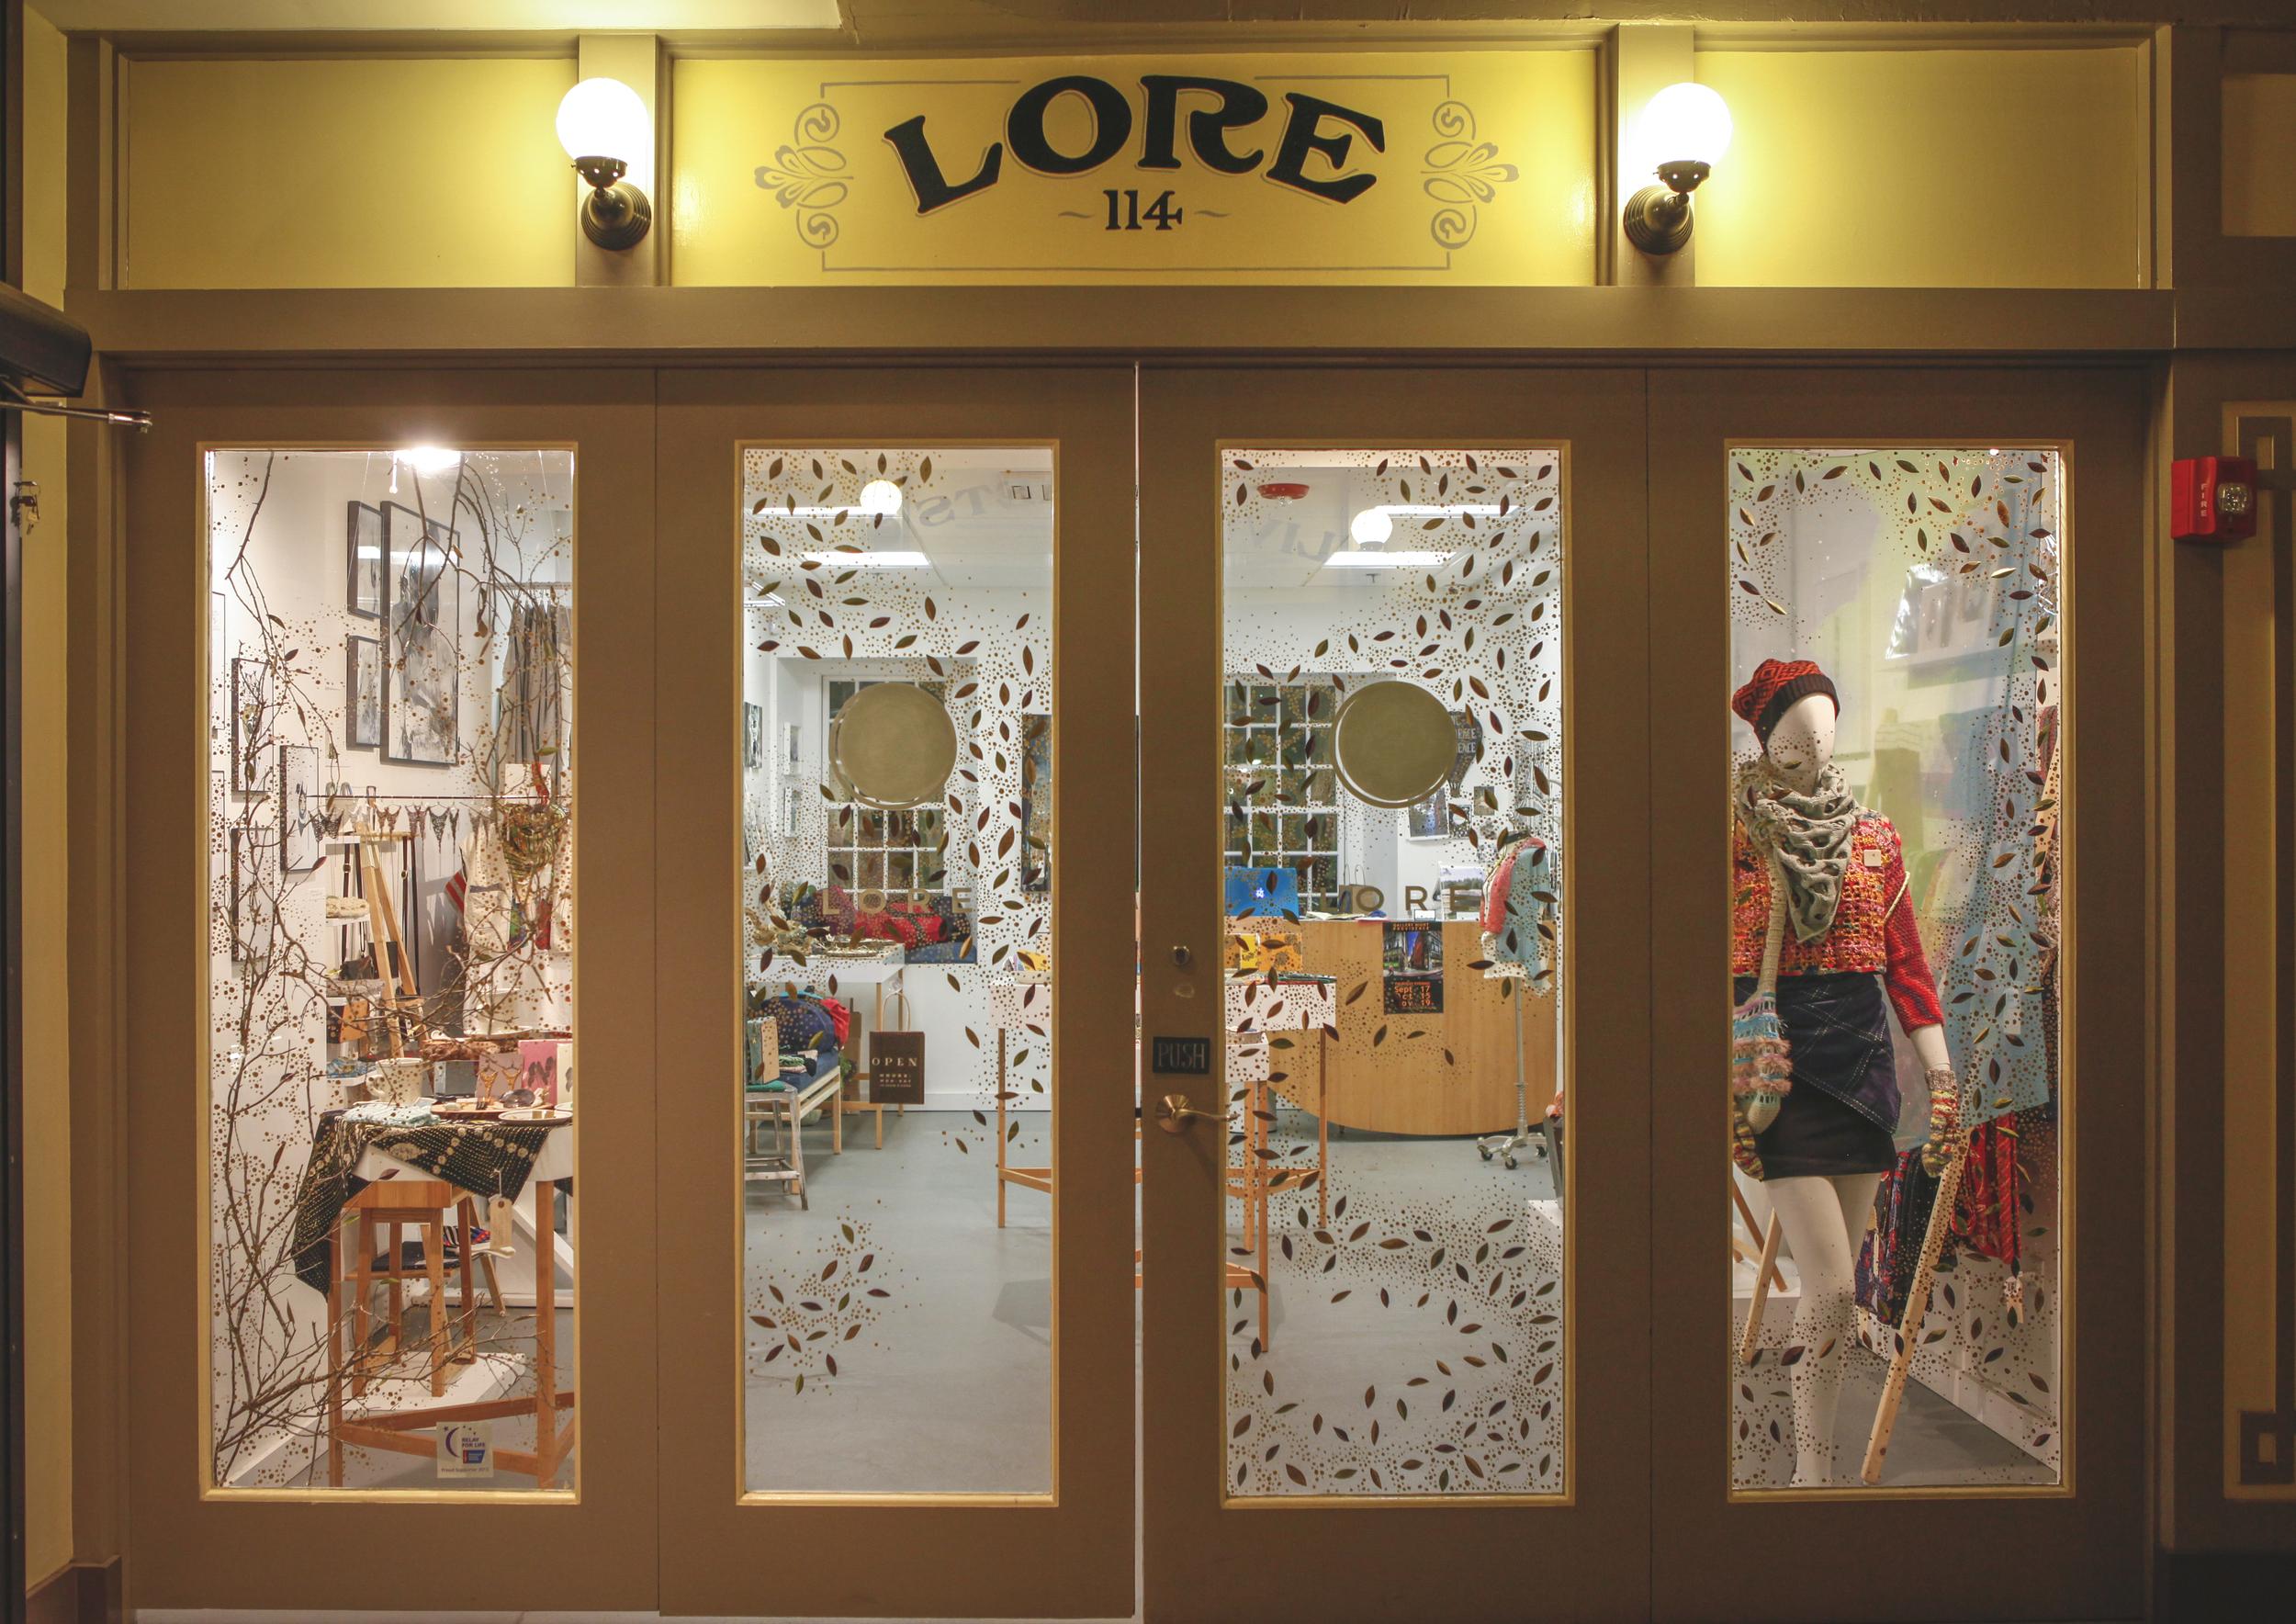 lore_front.JPG